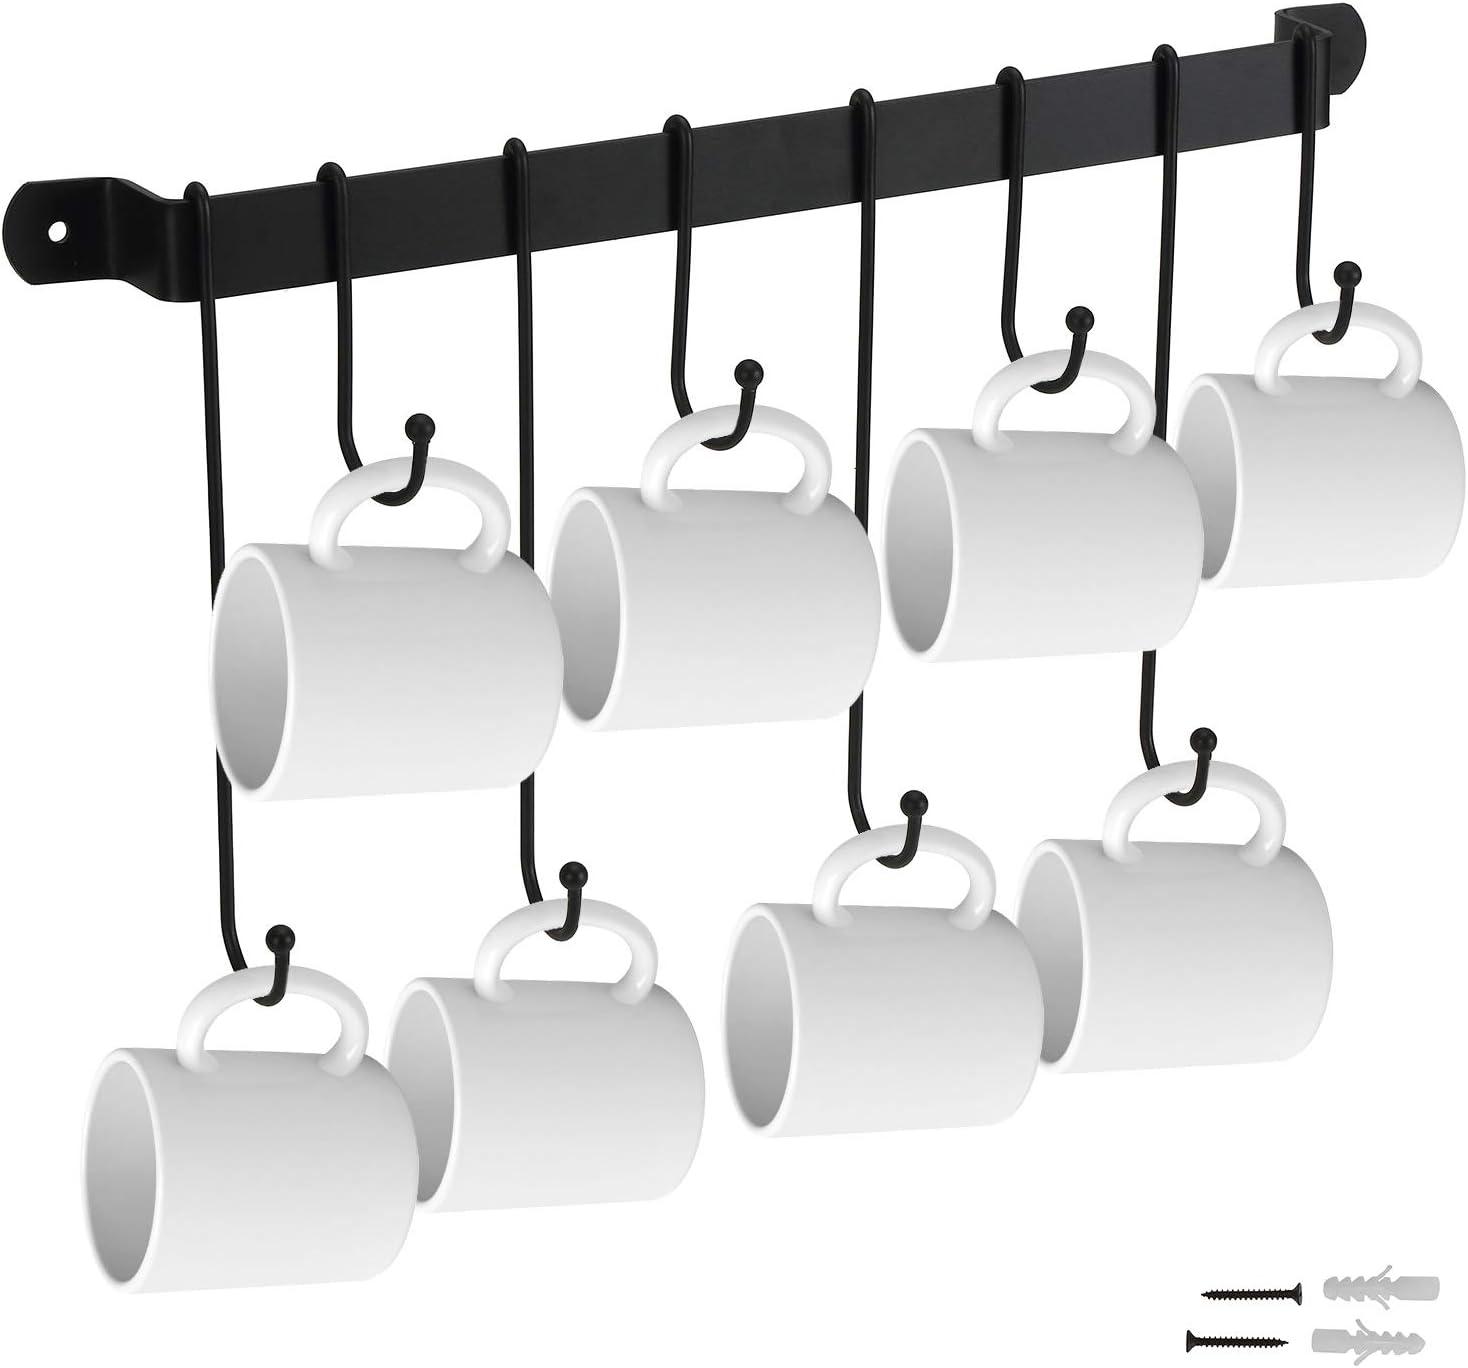 Suwimut Sale price Coffee Mug Rack 5 popular Cup Hangers Holder Wall Org Mounted